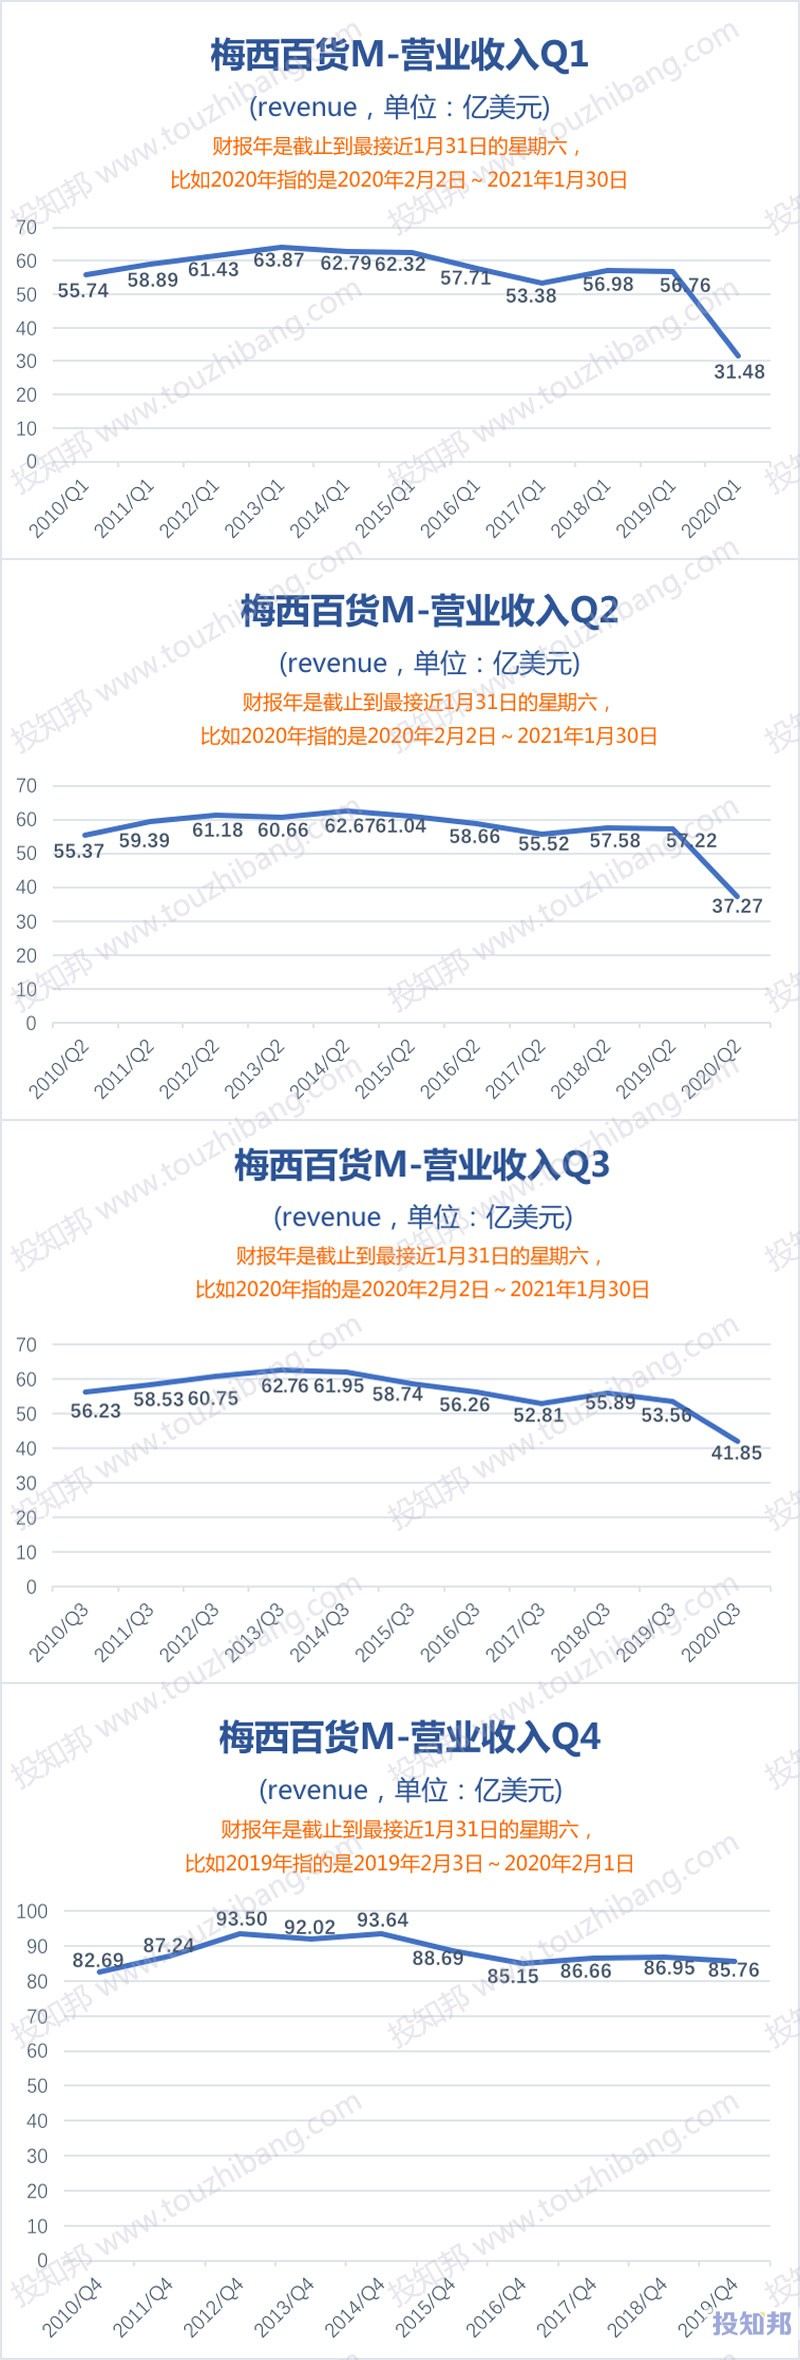 Macy's梅西百货(M)财报数据图示(2010年~2020财报年Q3,更新)